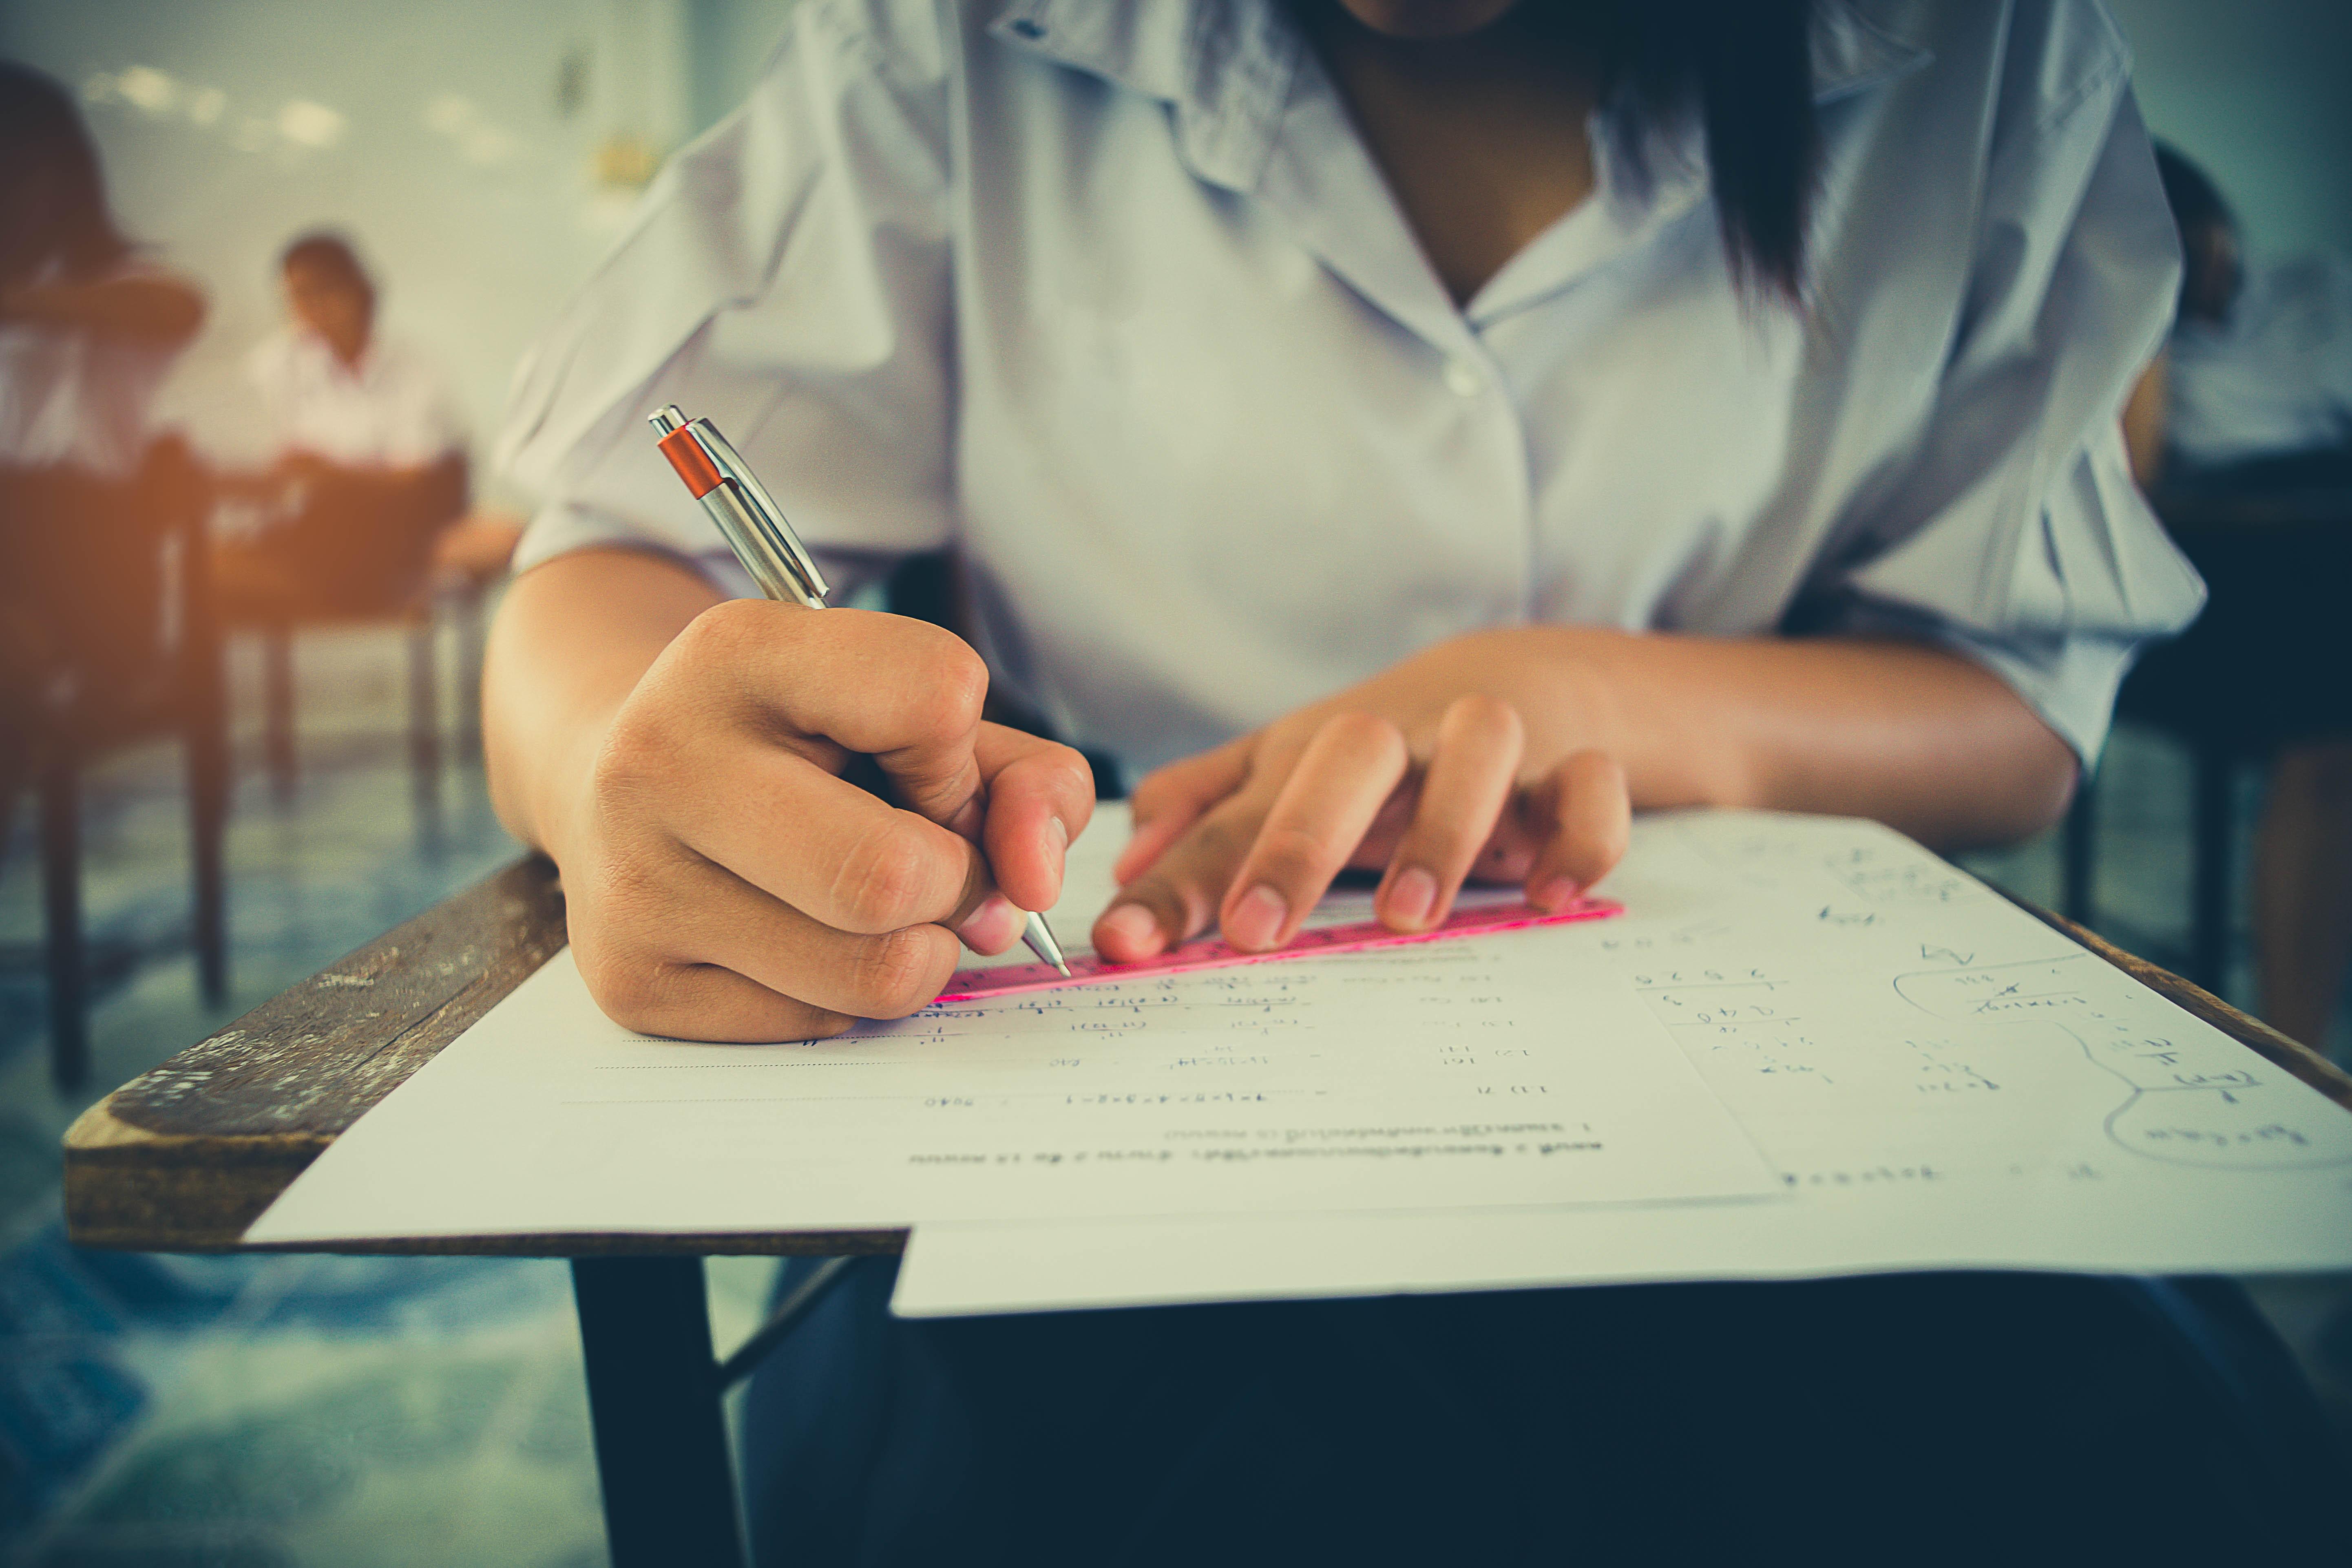 Singapore's stressed schoolchildren show human cost of city